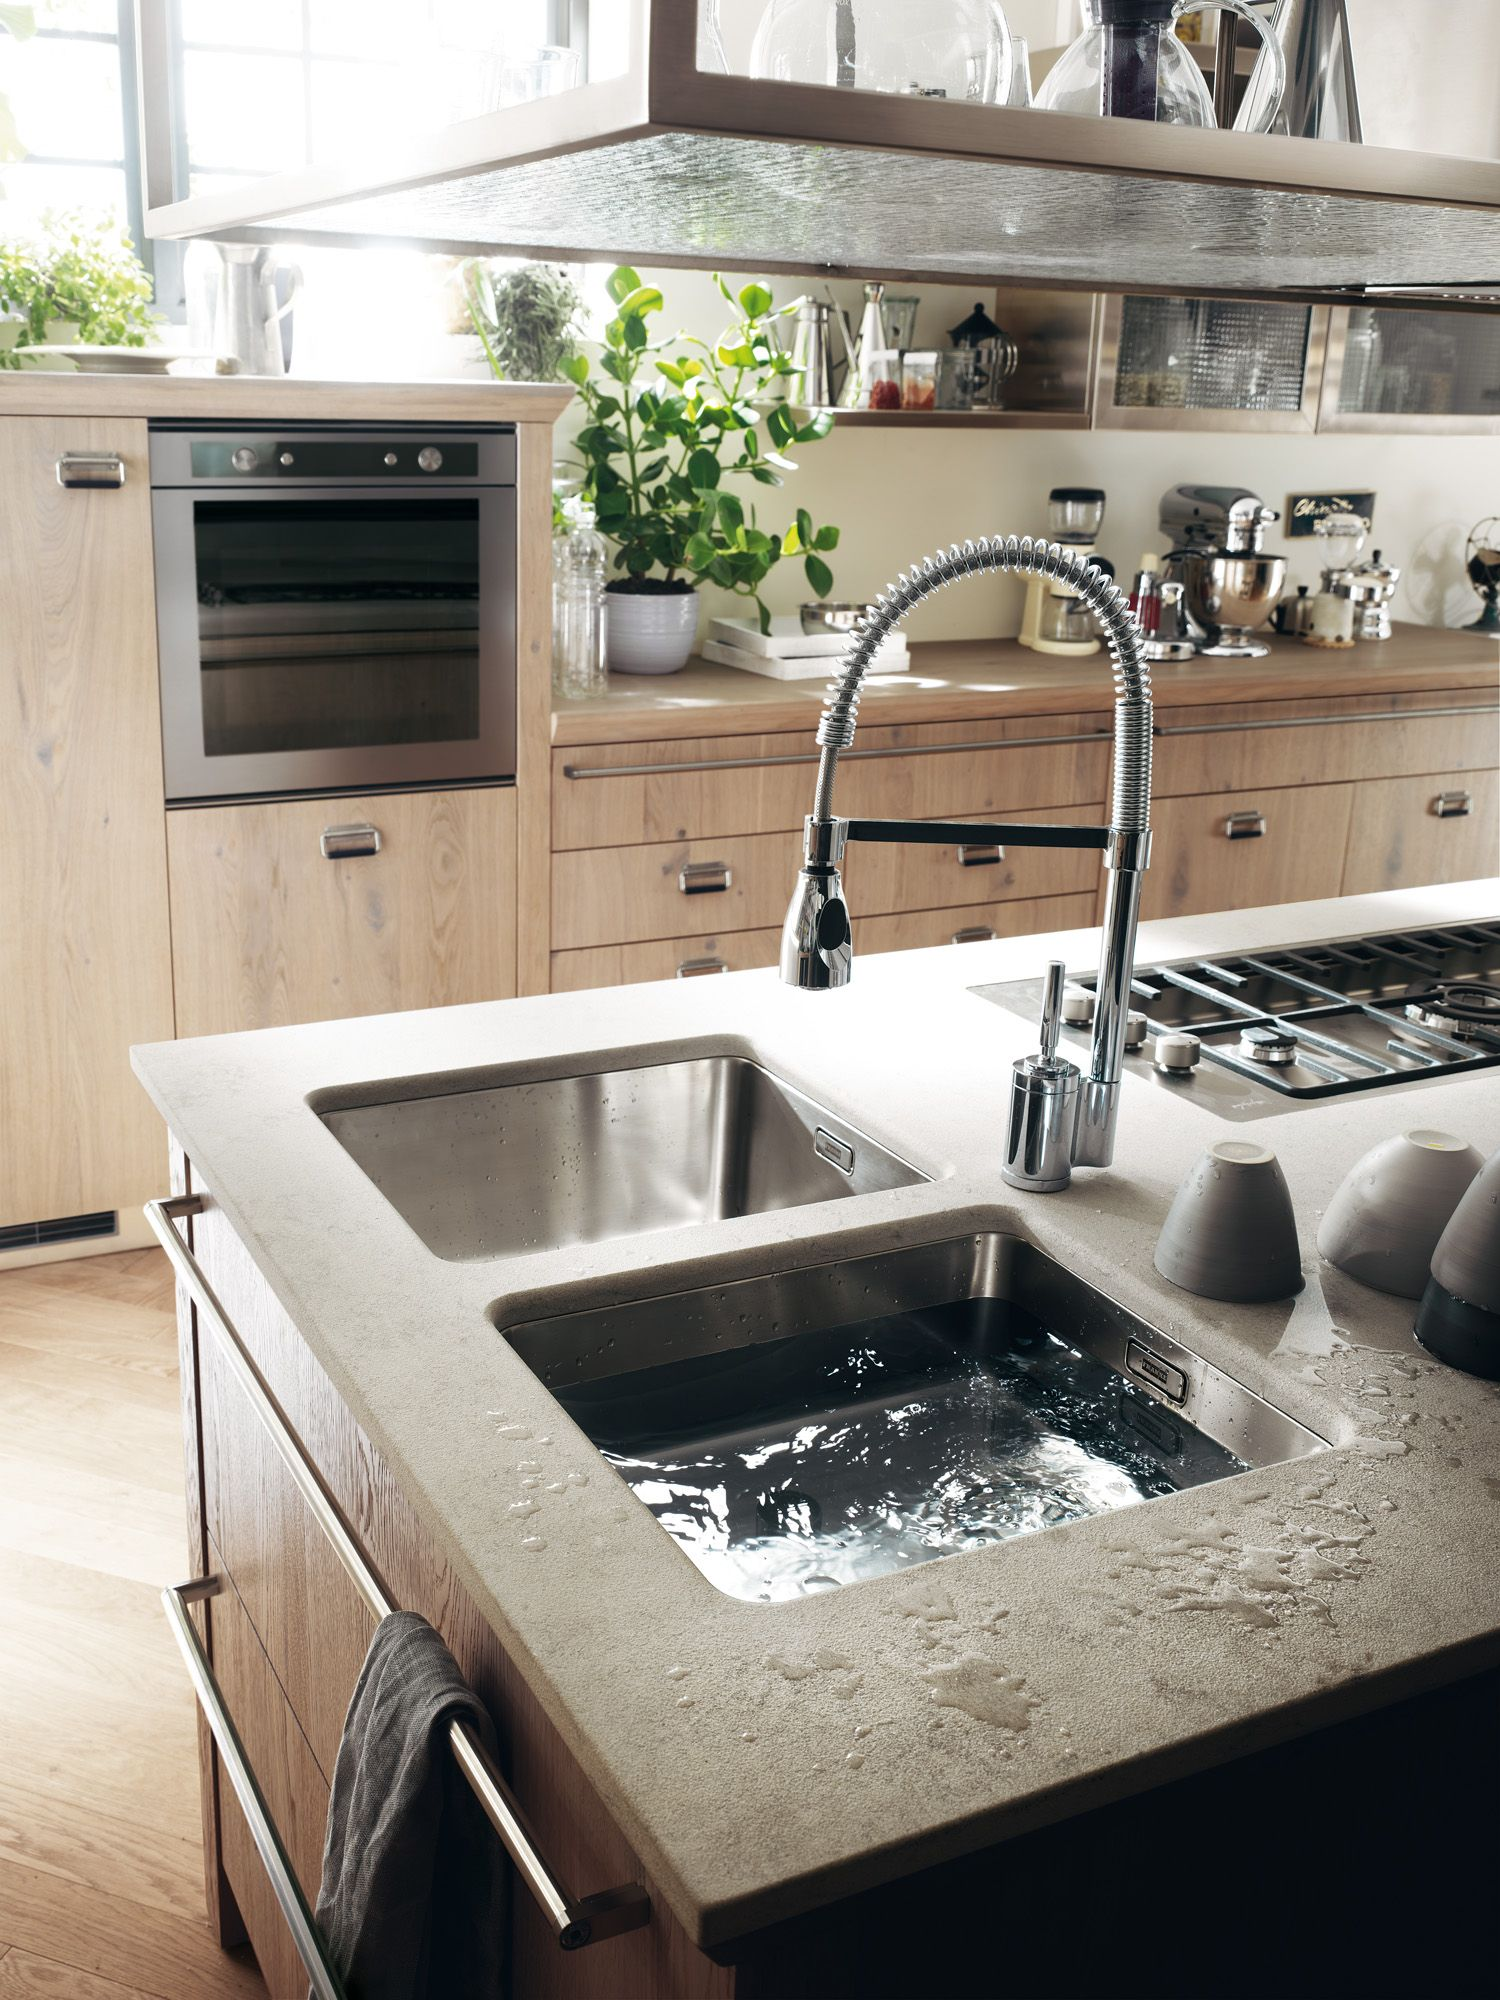 D'life home interiors ernakulam kerala arredamenti attanasio attanasiodesign on pinterest